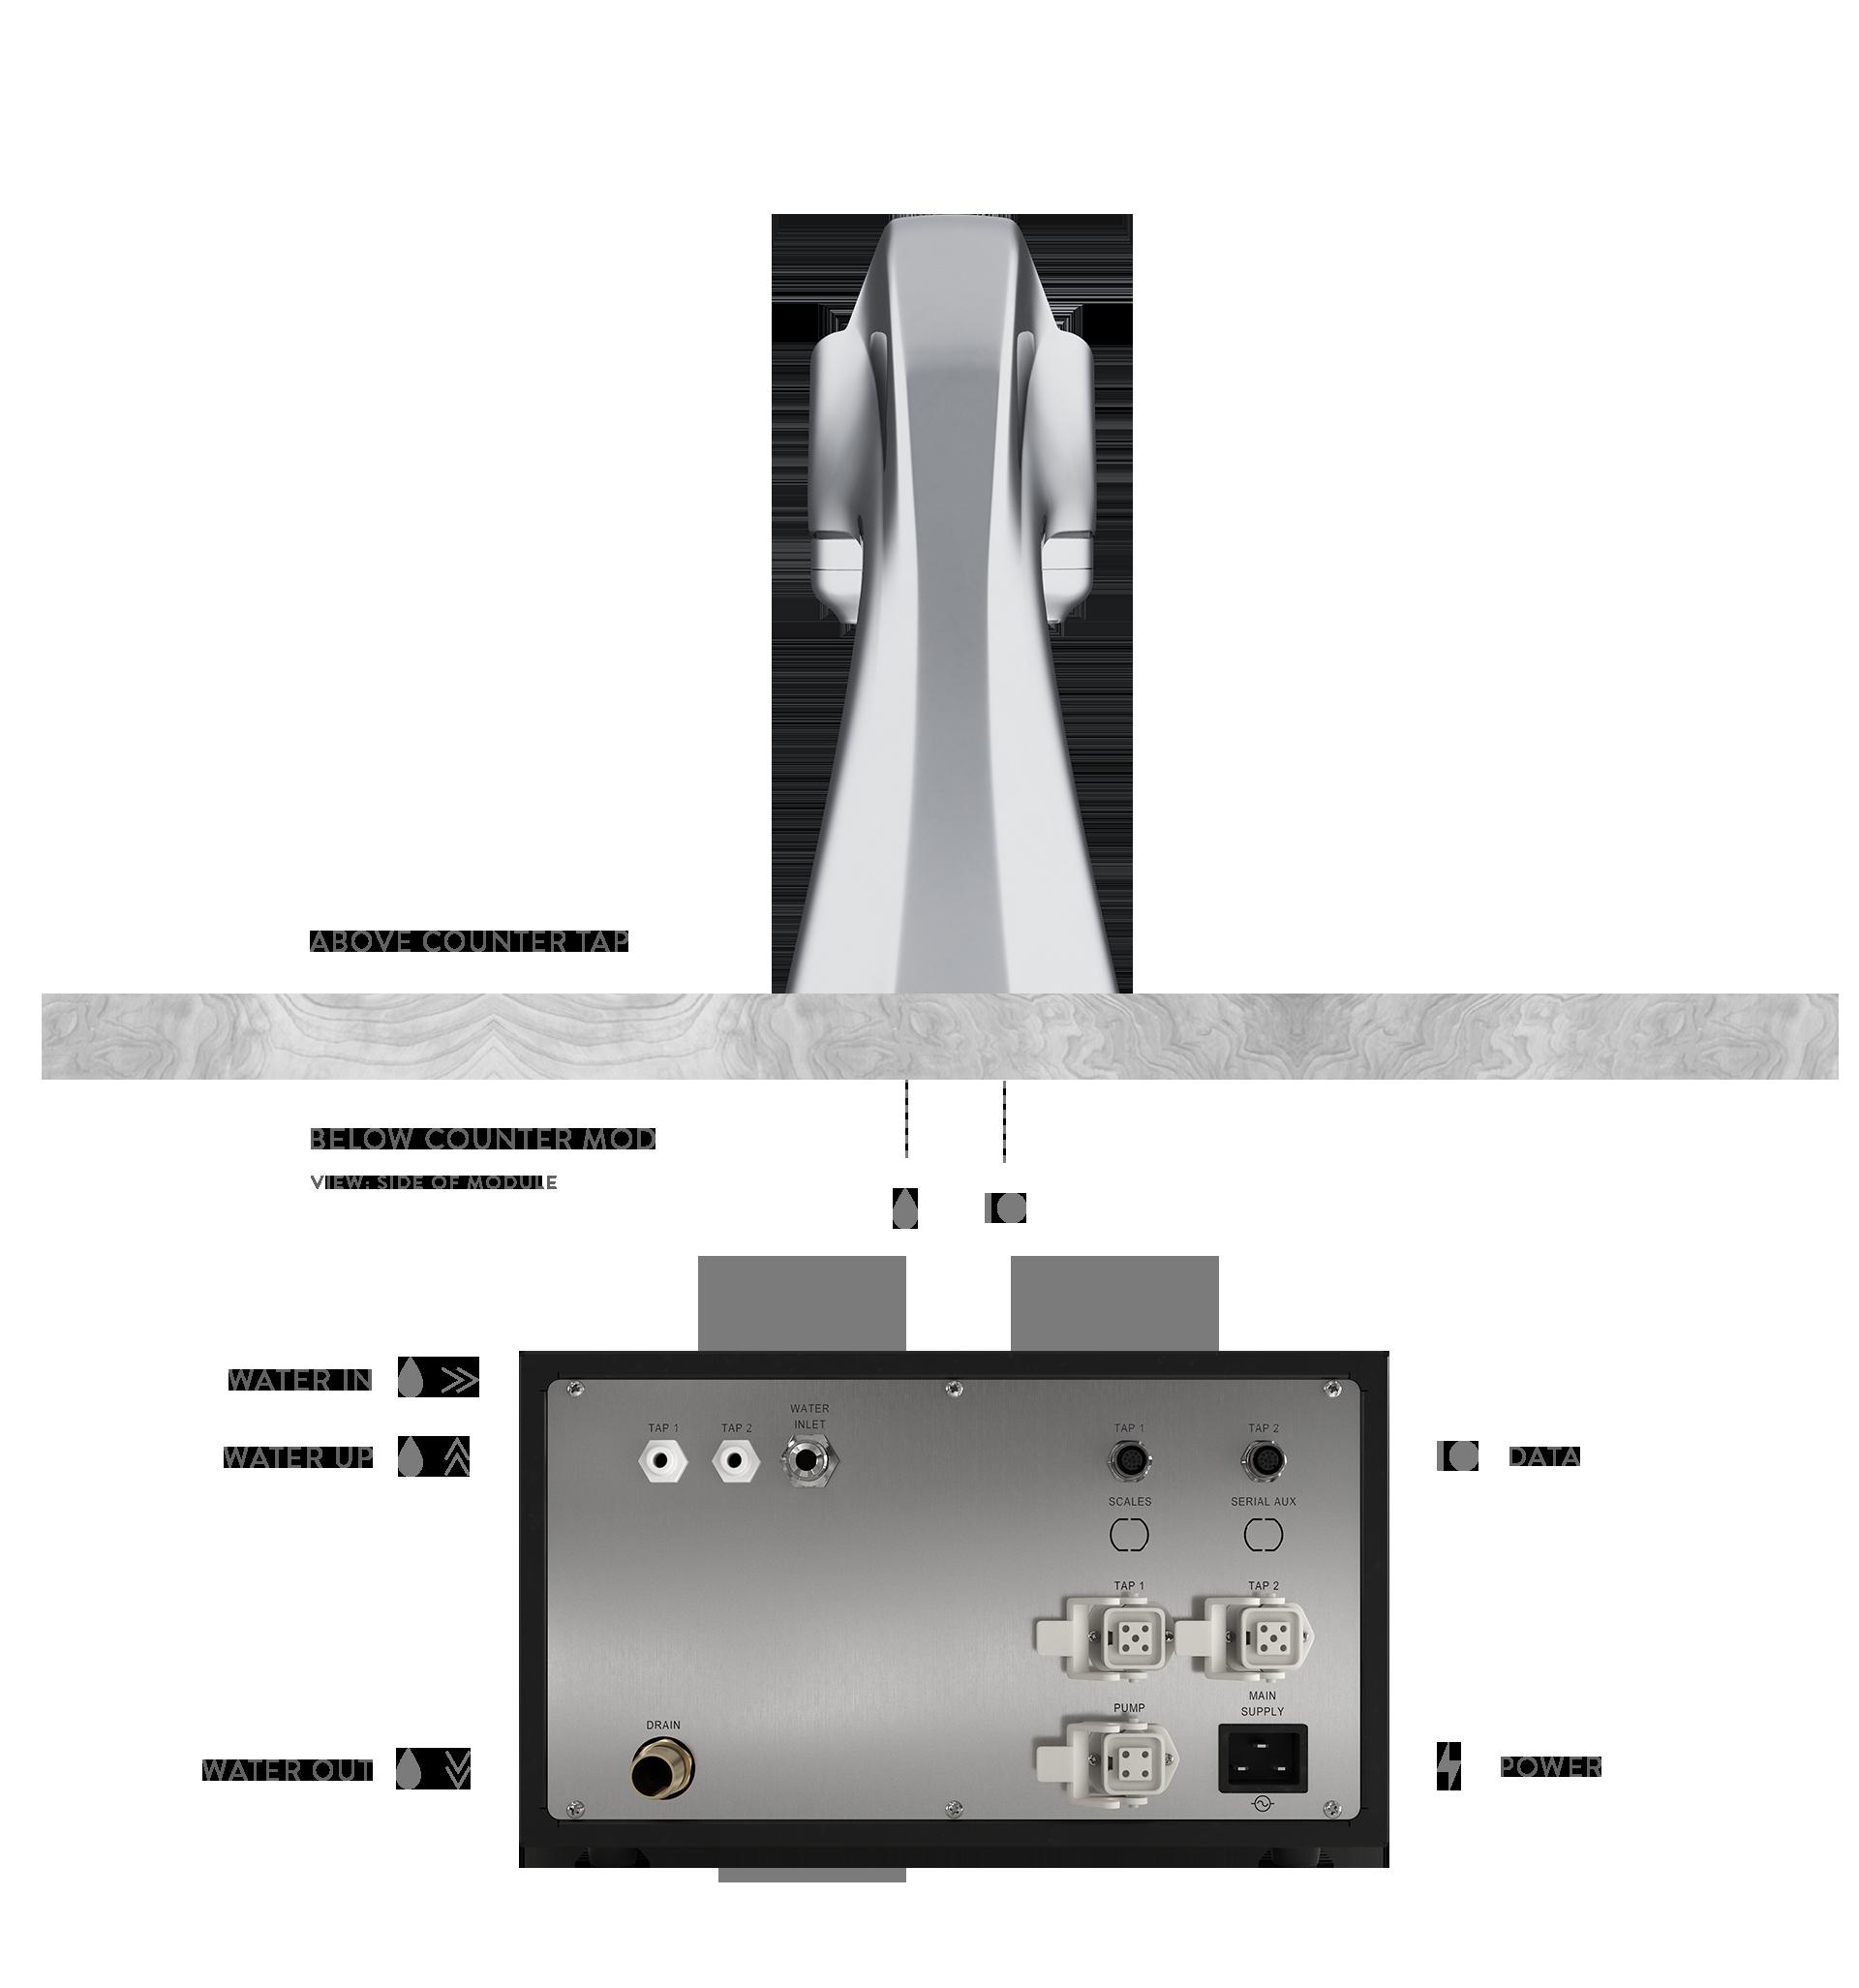 diagram showing how modbar AV undercounter espresso machine connects